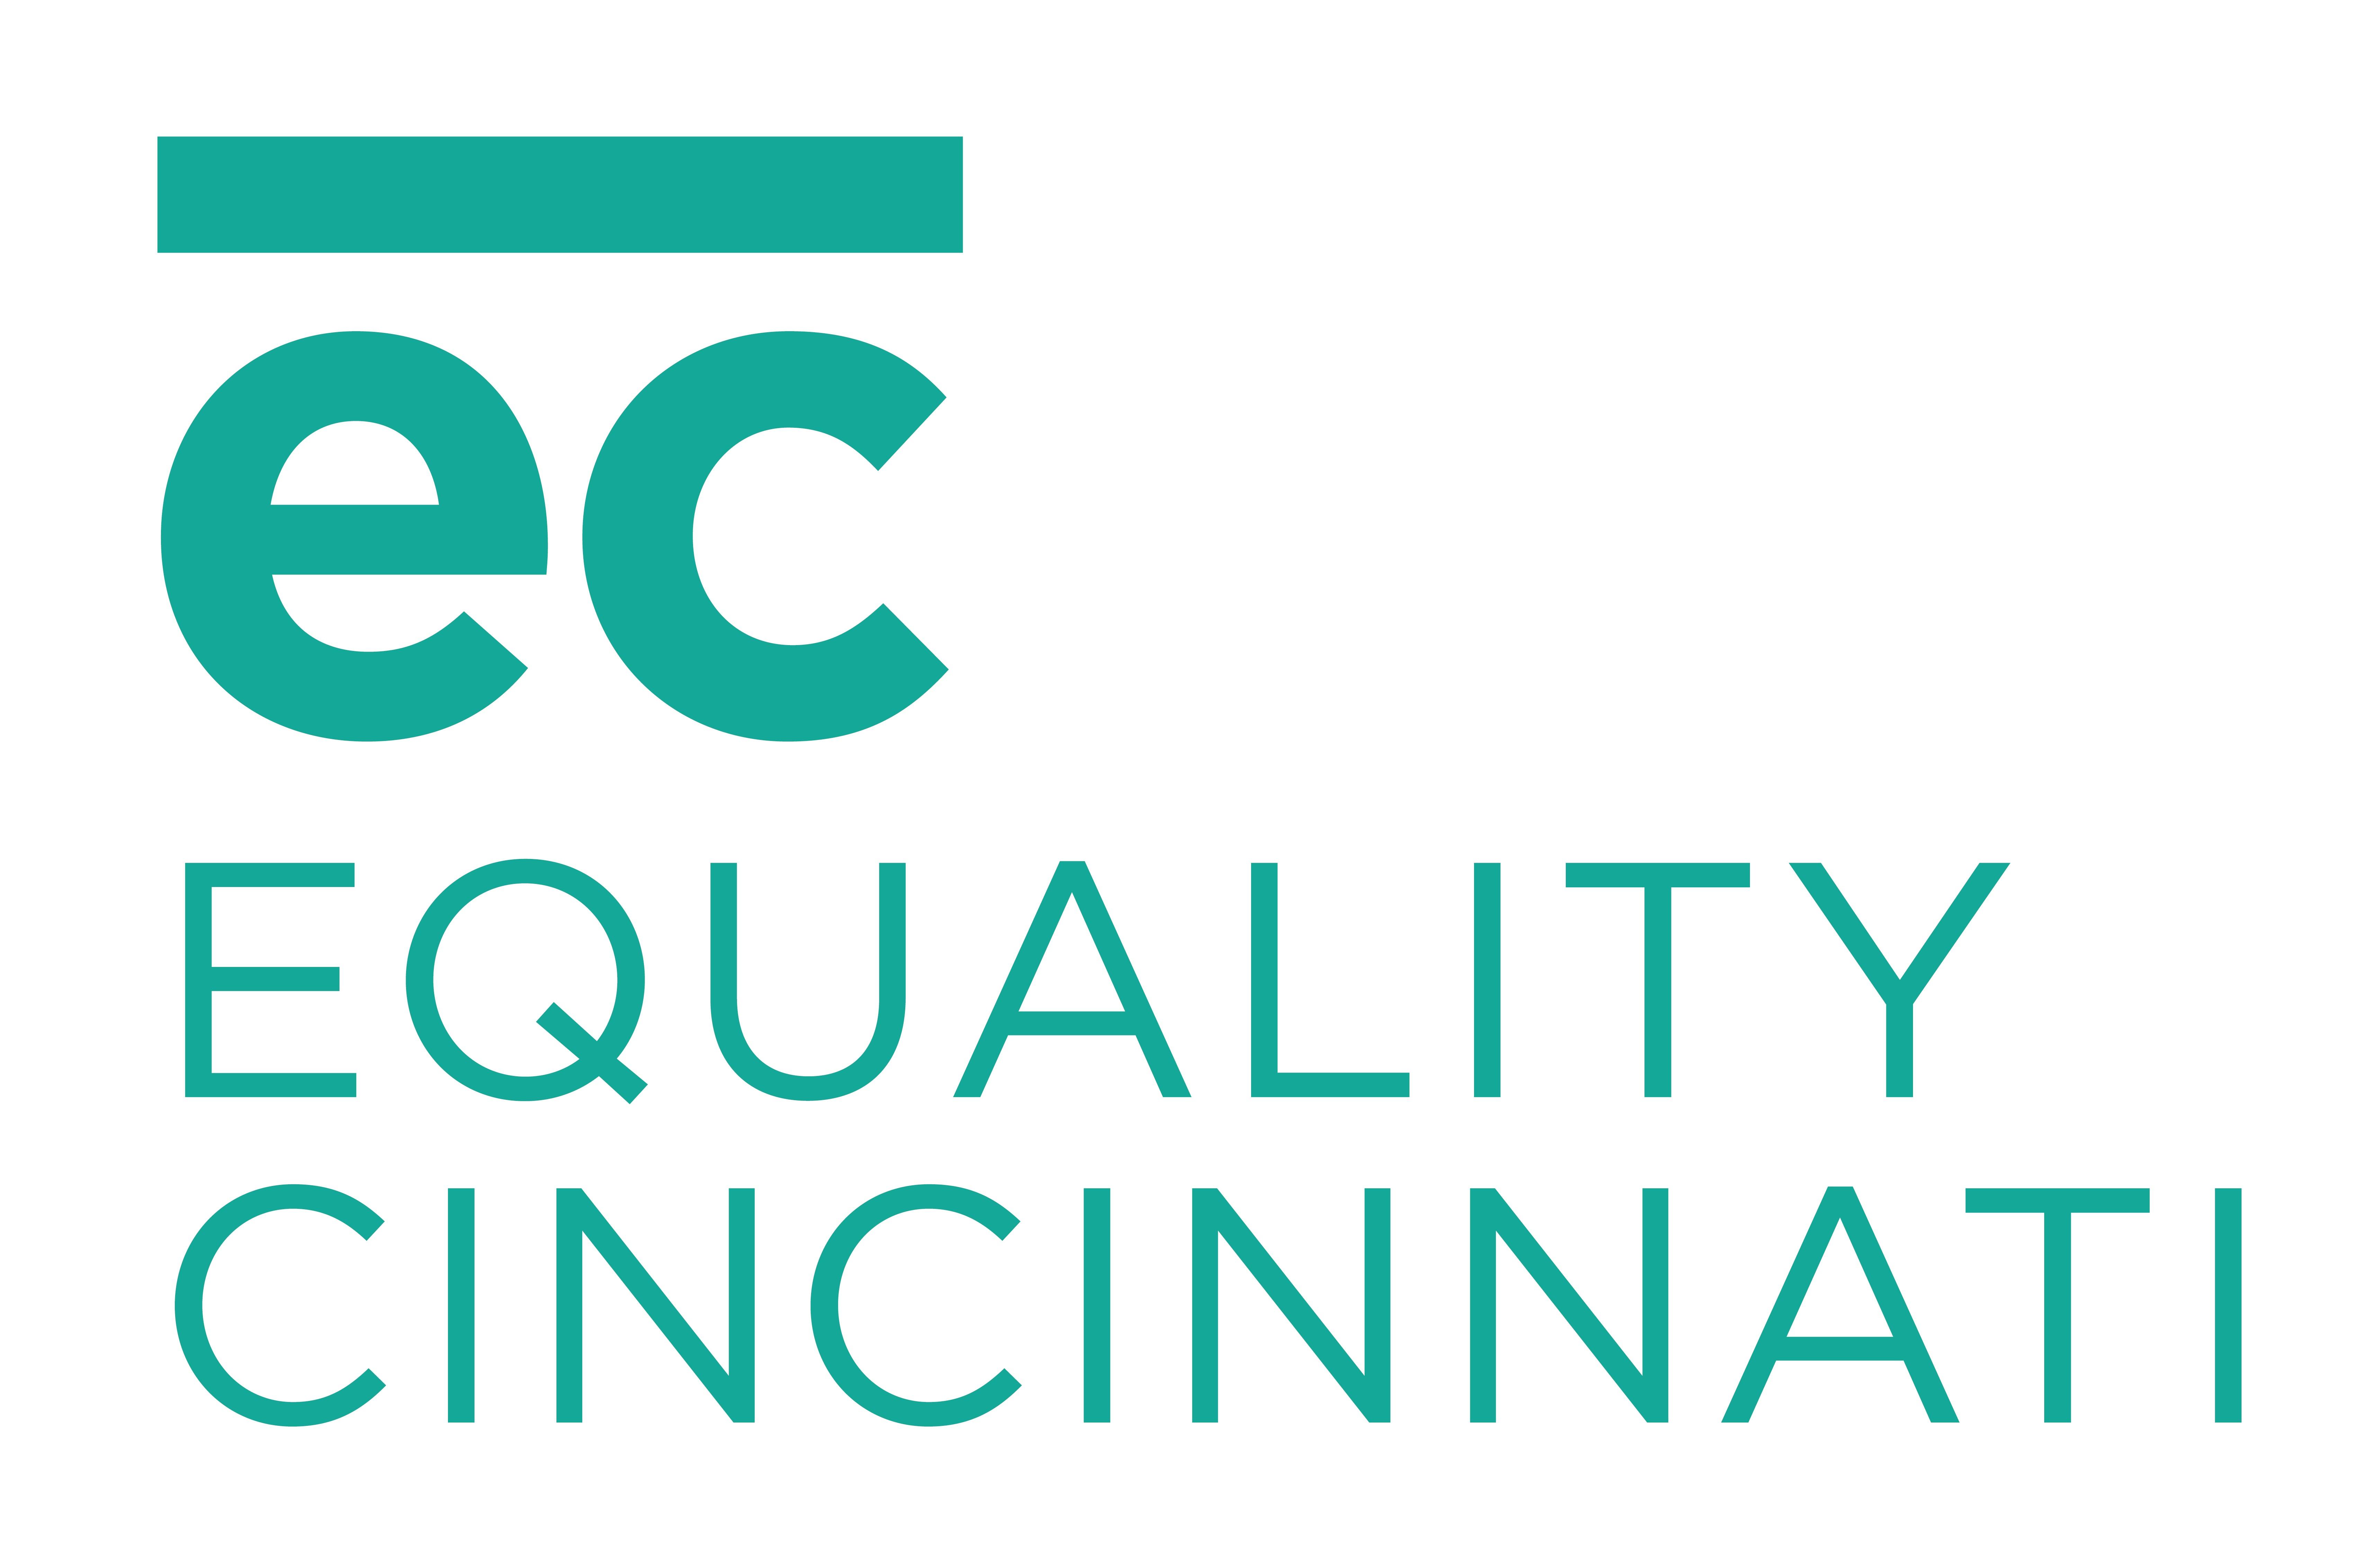 Equality_Cincinnati_Logo_2016.jpg